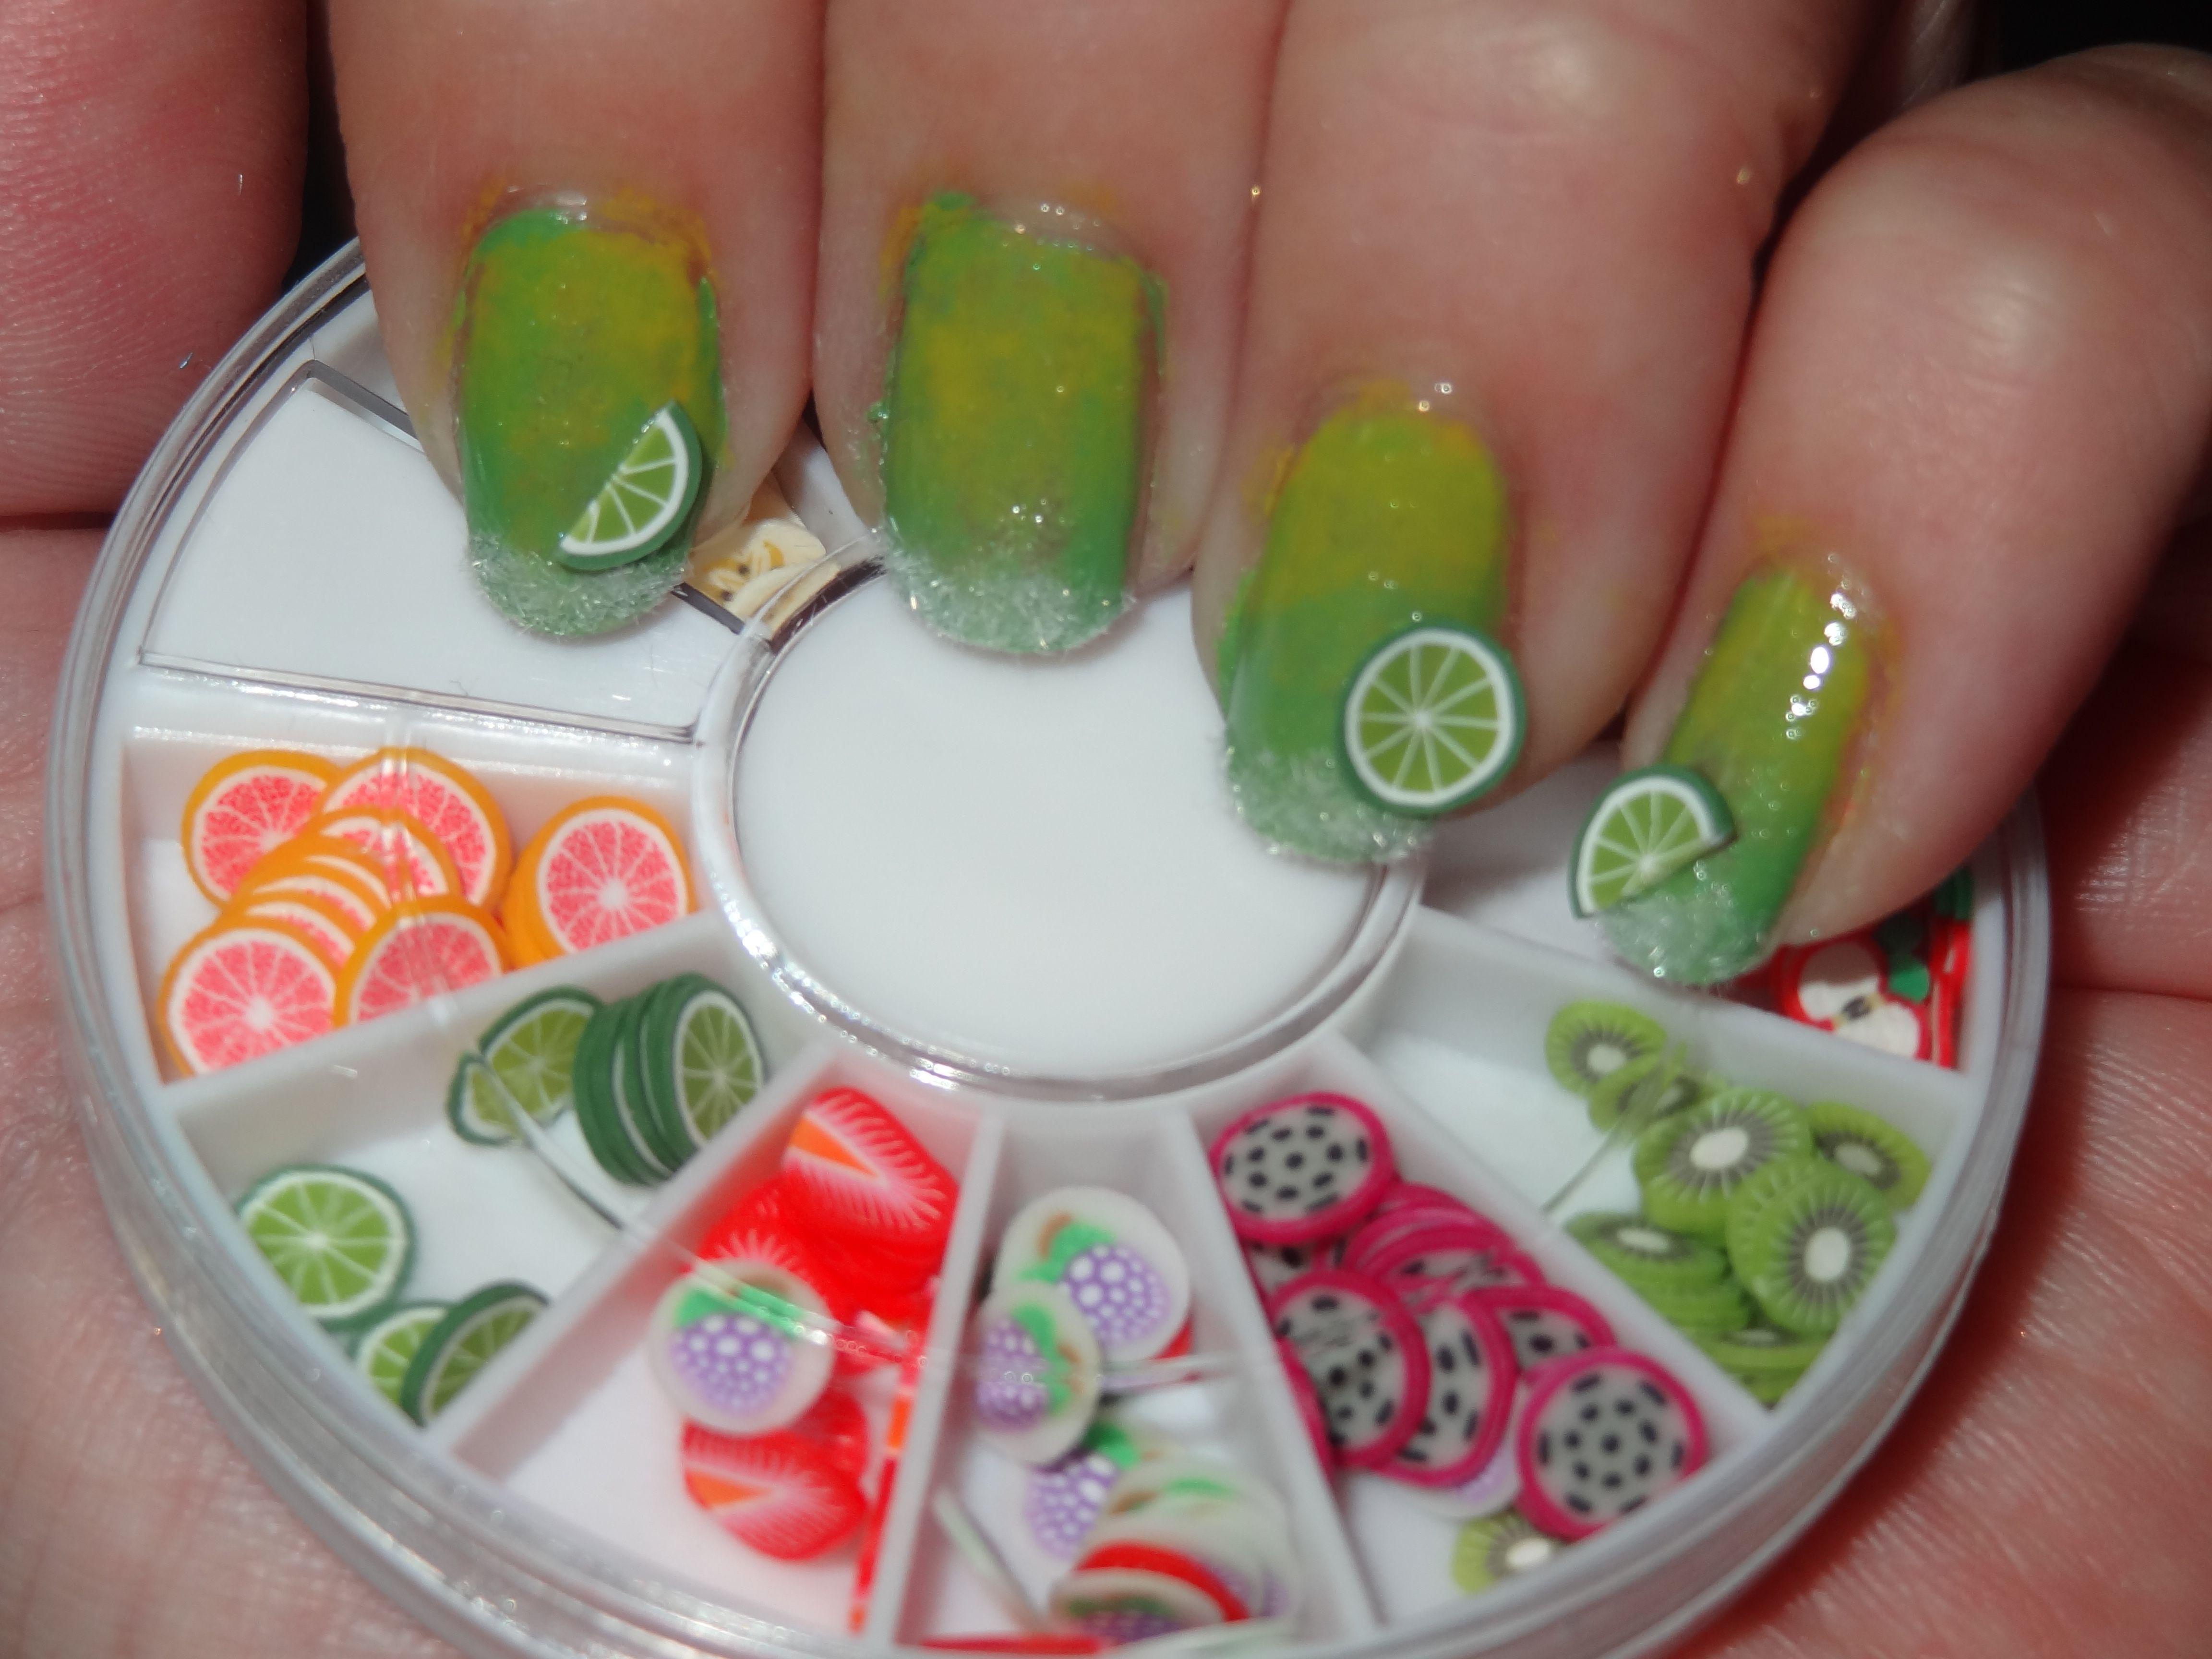 Margarita Nail Art With Mash Nails Fruit Fimo Cane Wheel Nails By